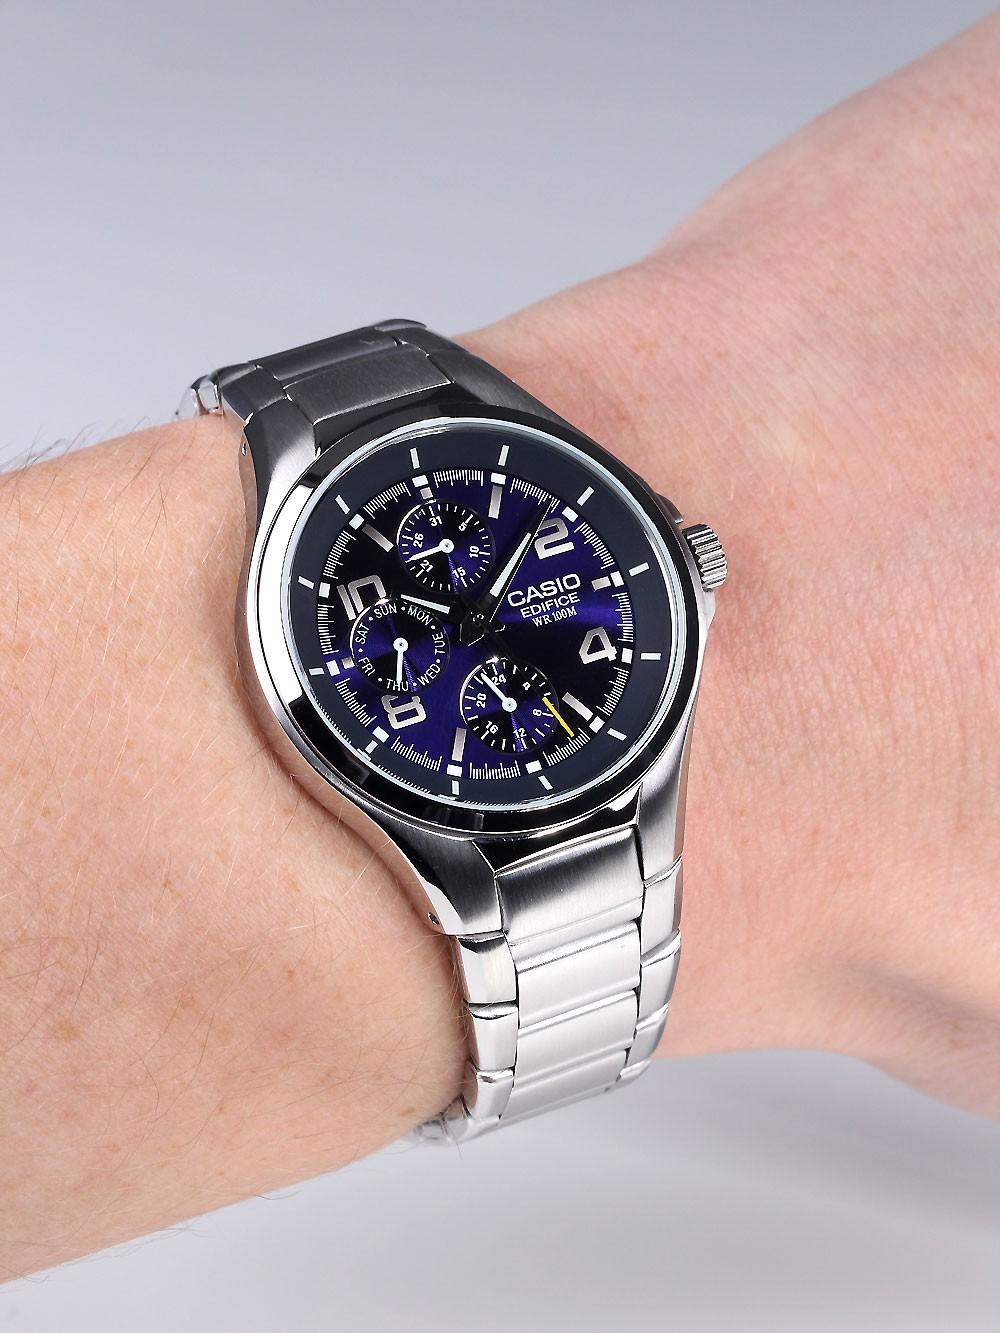 Наручные часы Casio EF-316D-2AVEF - отзывы bb7dd34140b15